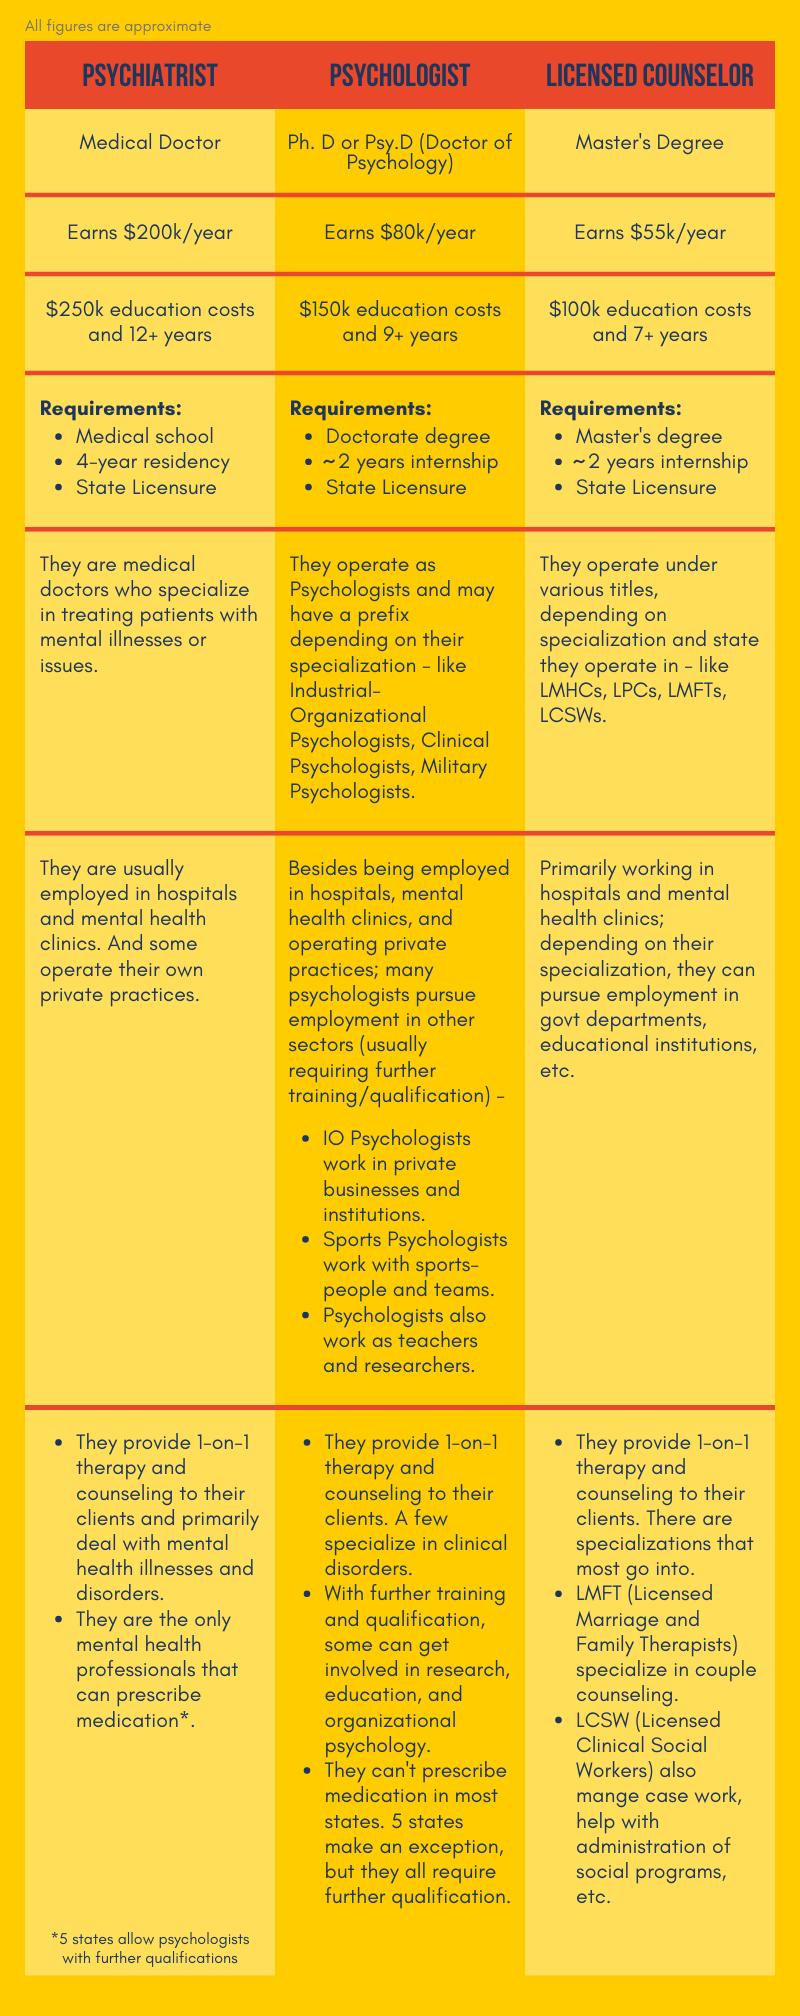 Psychology track distinctions